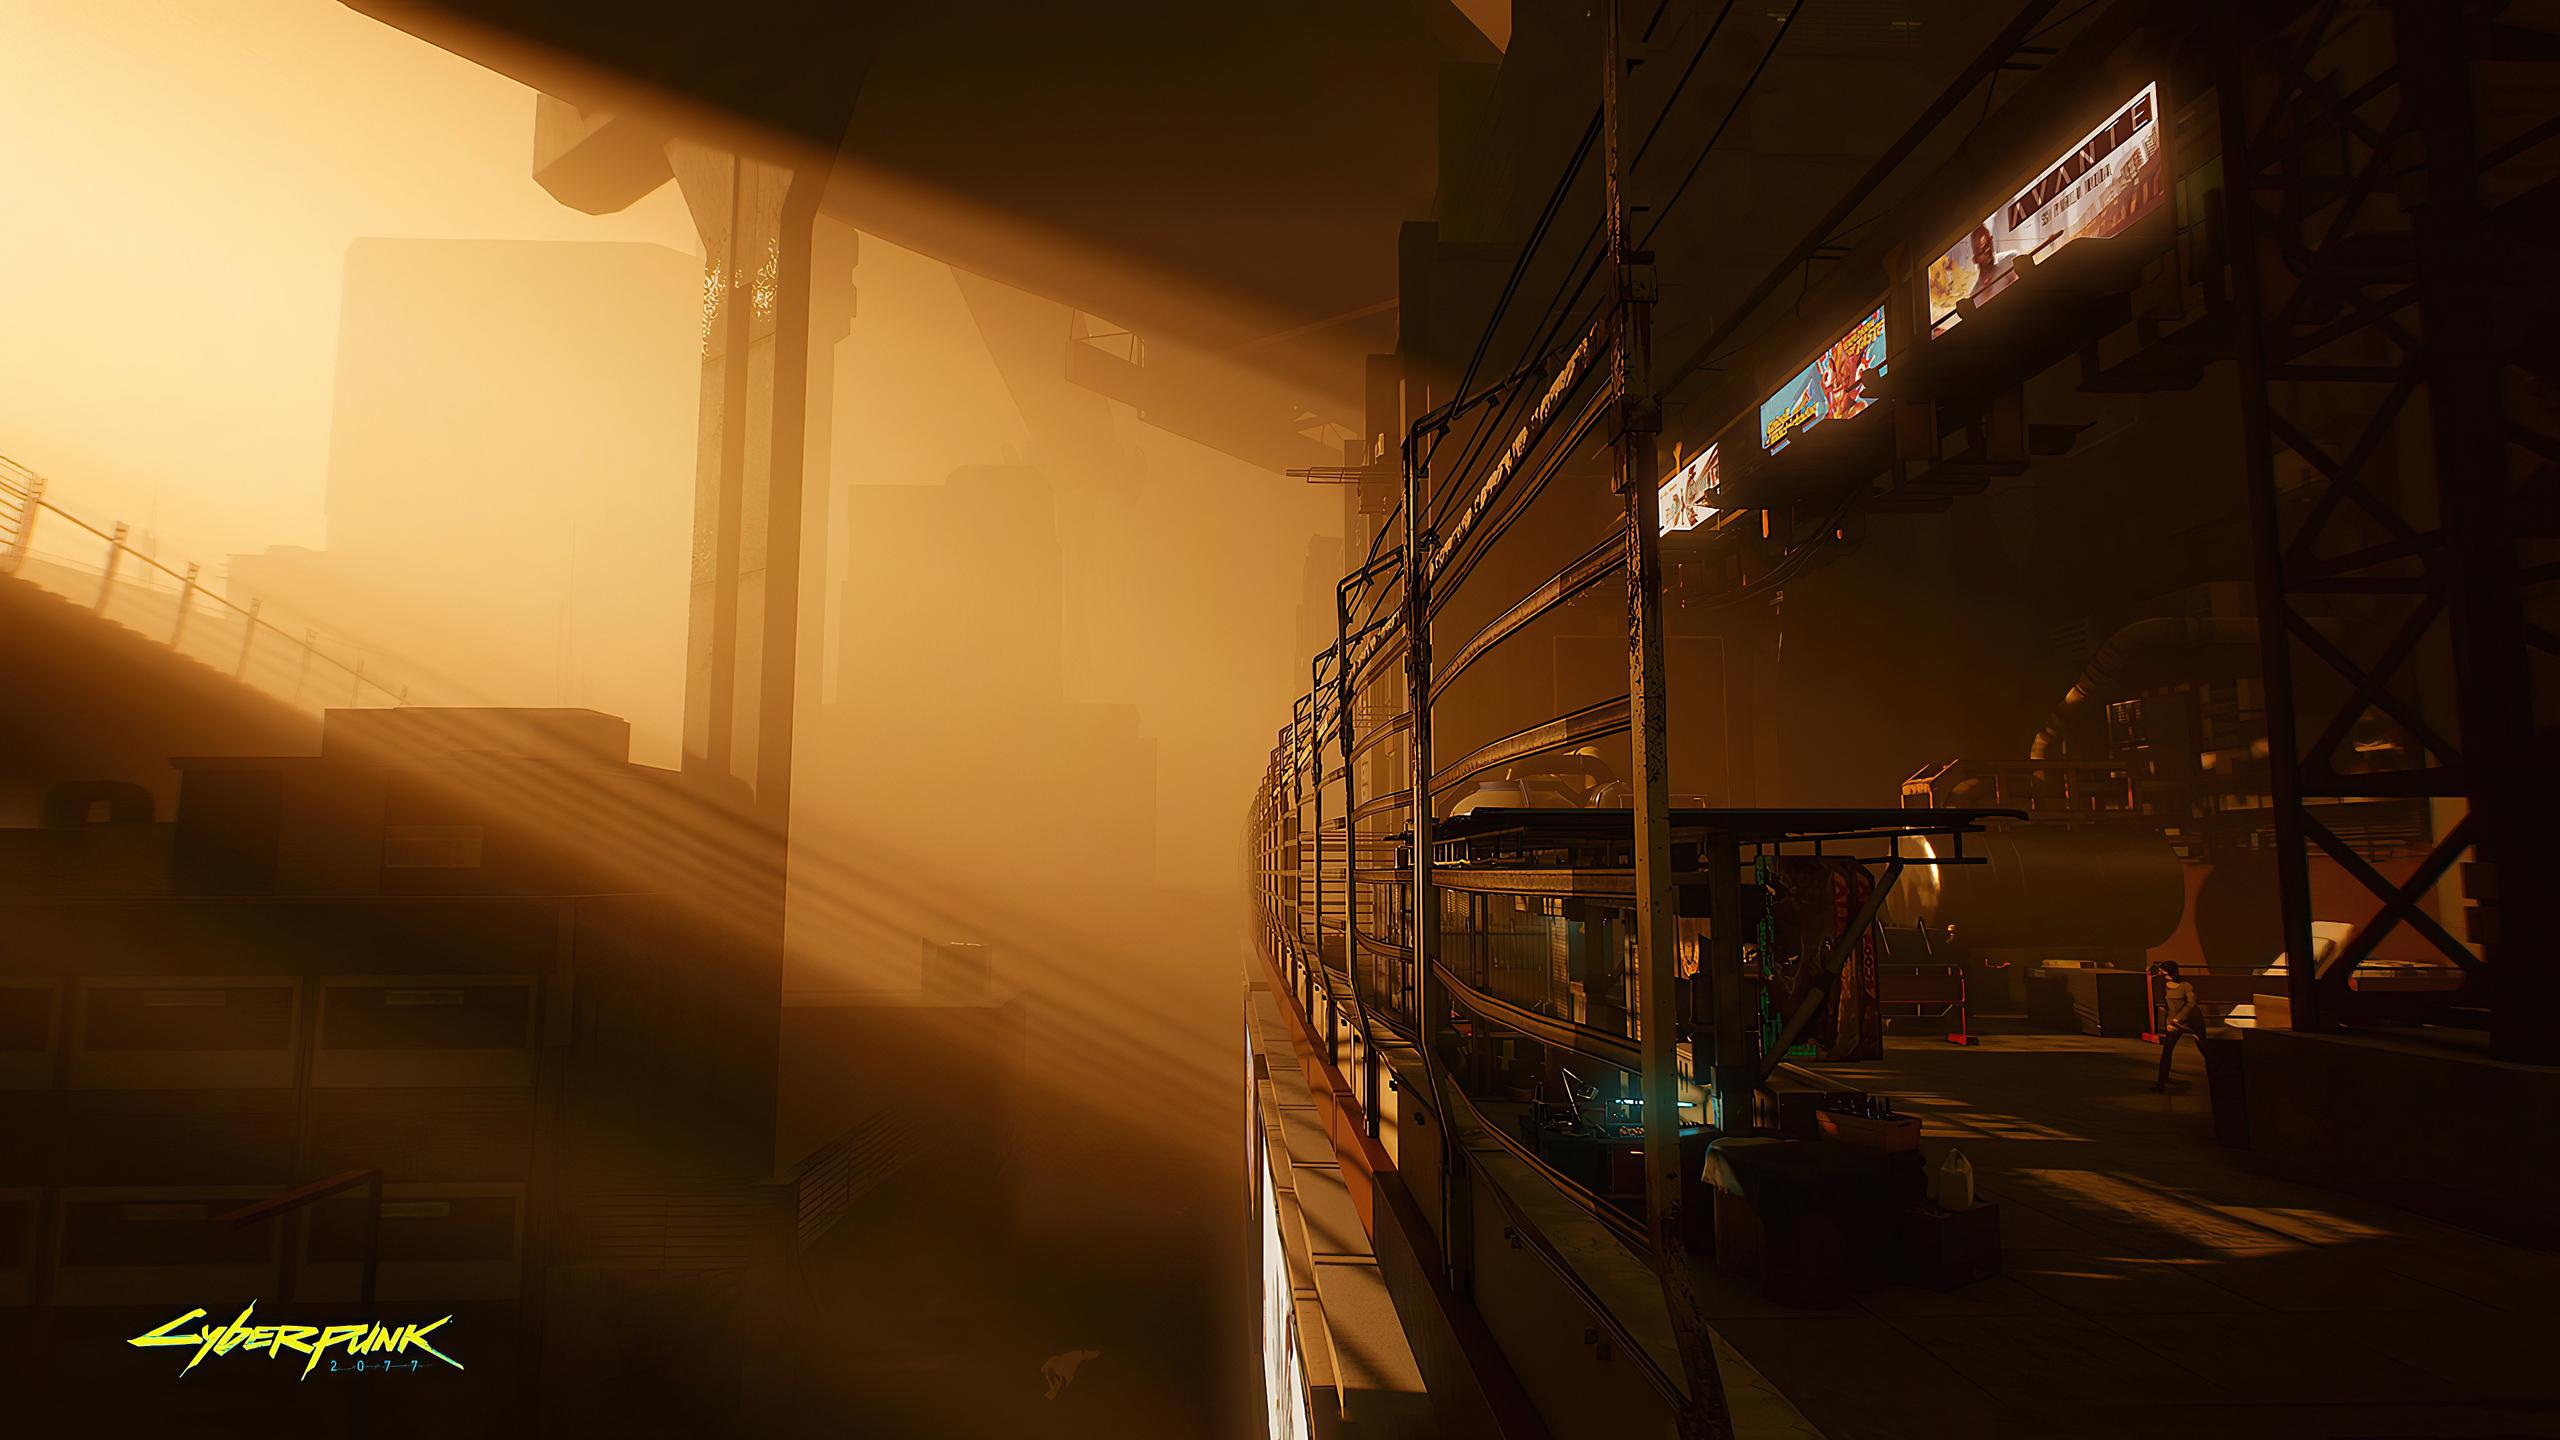 cyberpunk-2077-ray-of-light-zm.jpg